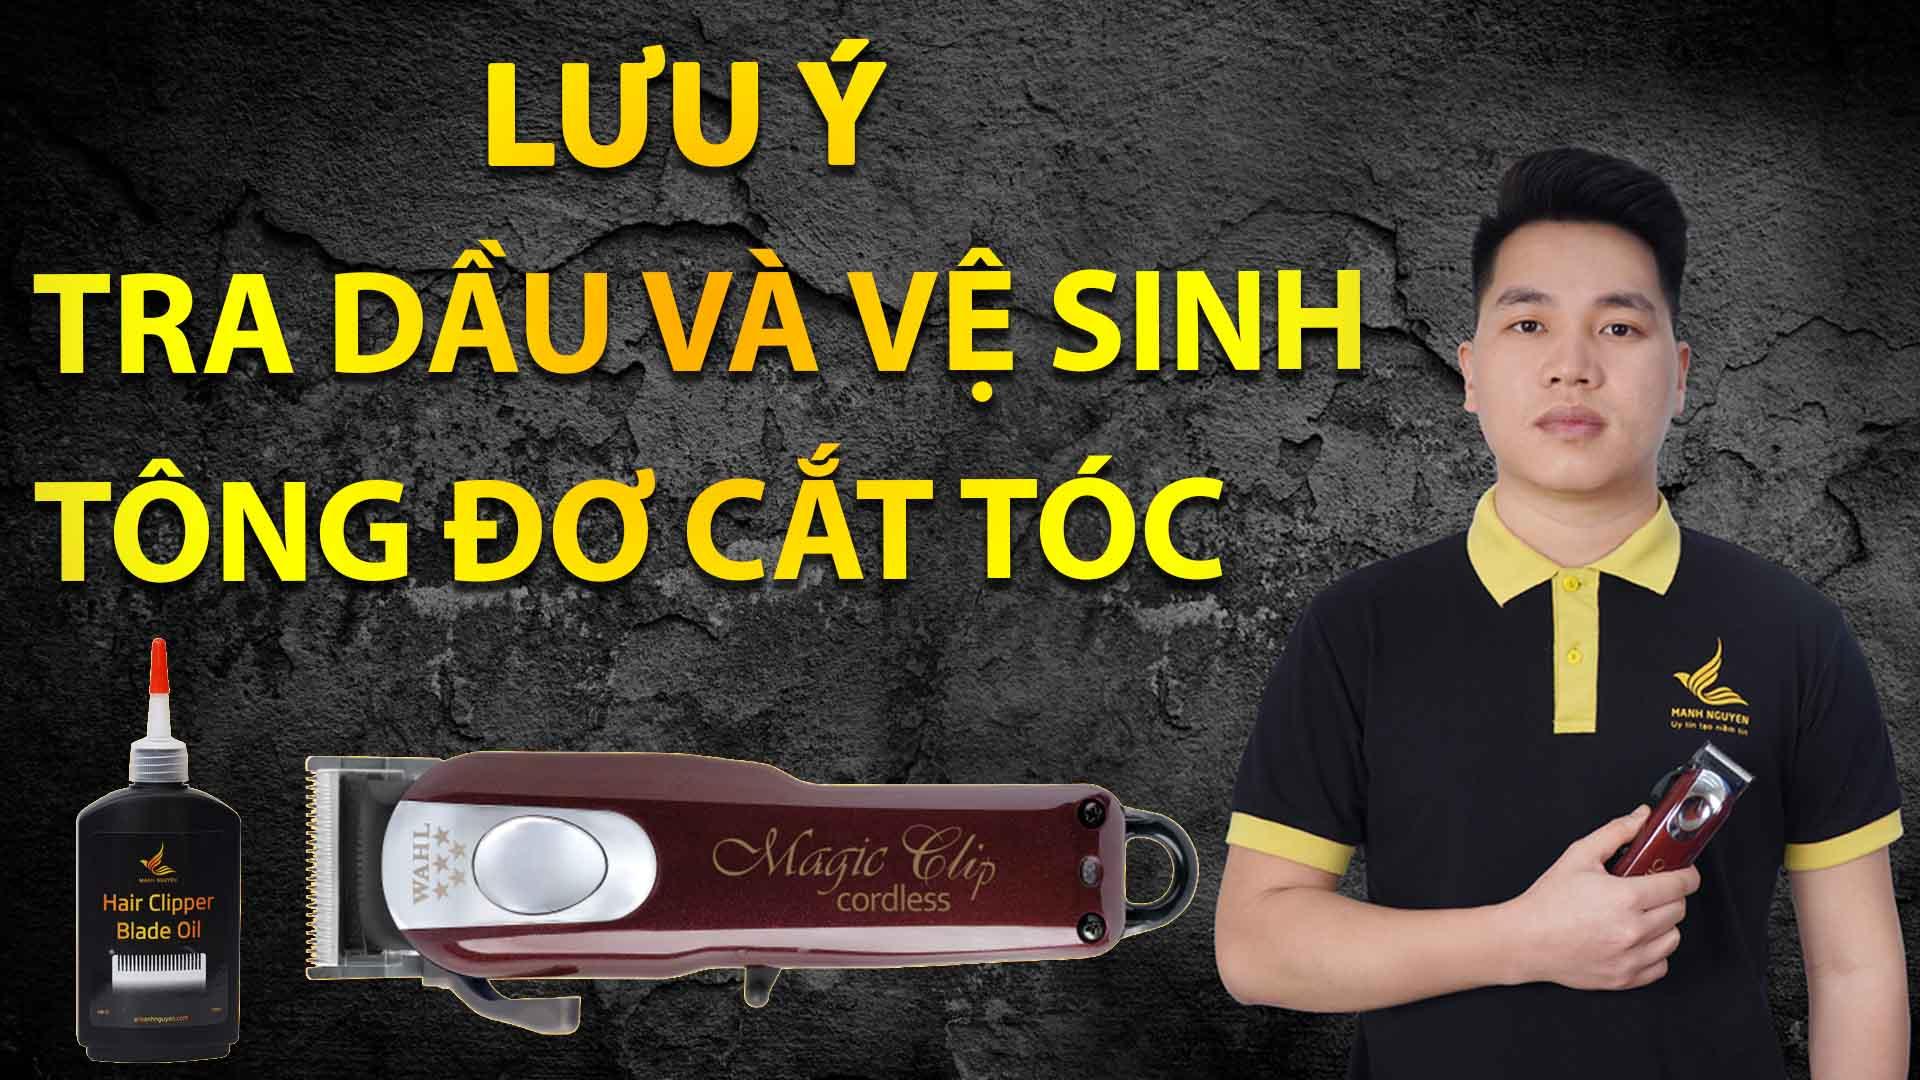 luu y tra dau va ve sinh tong do cat toc (1)